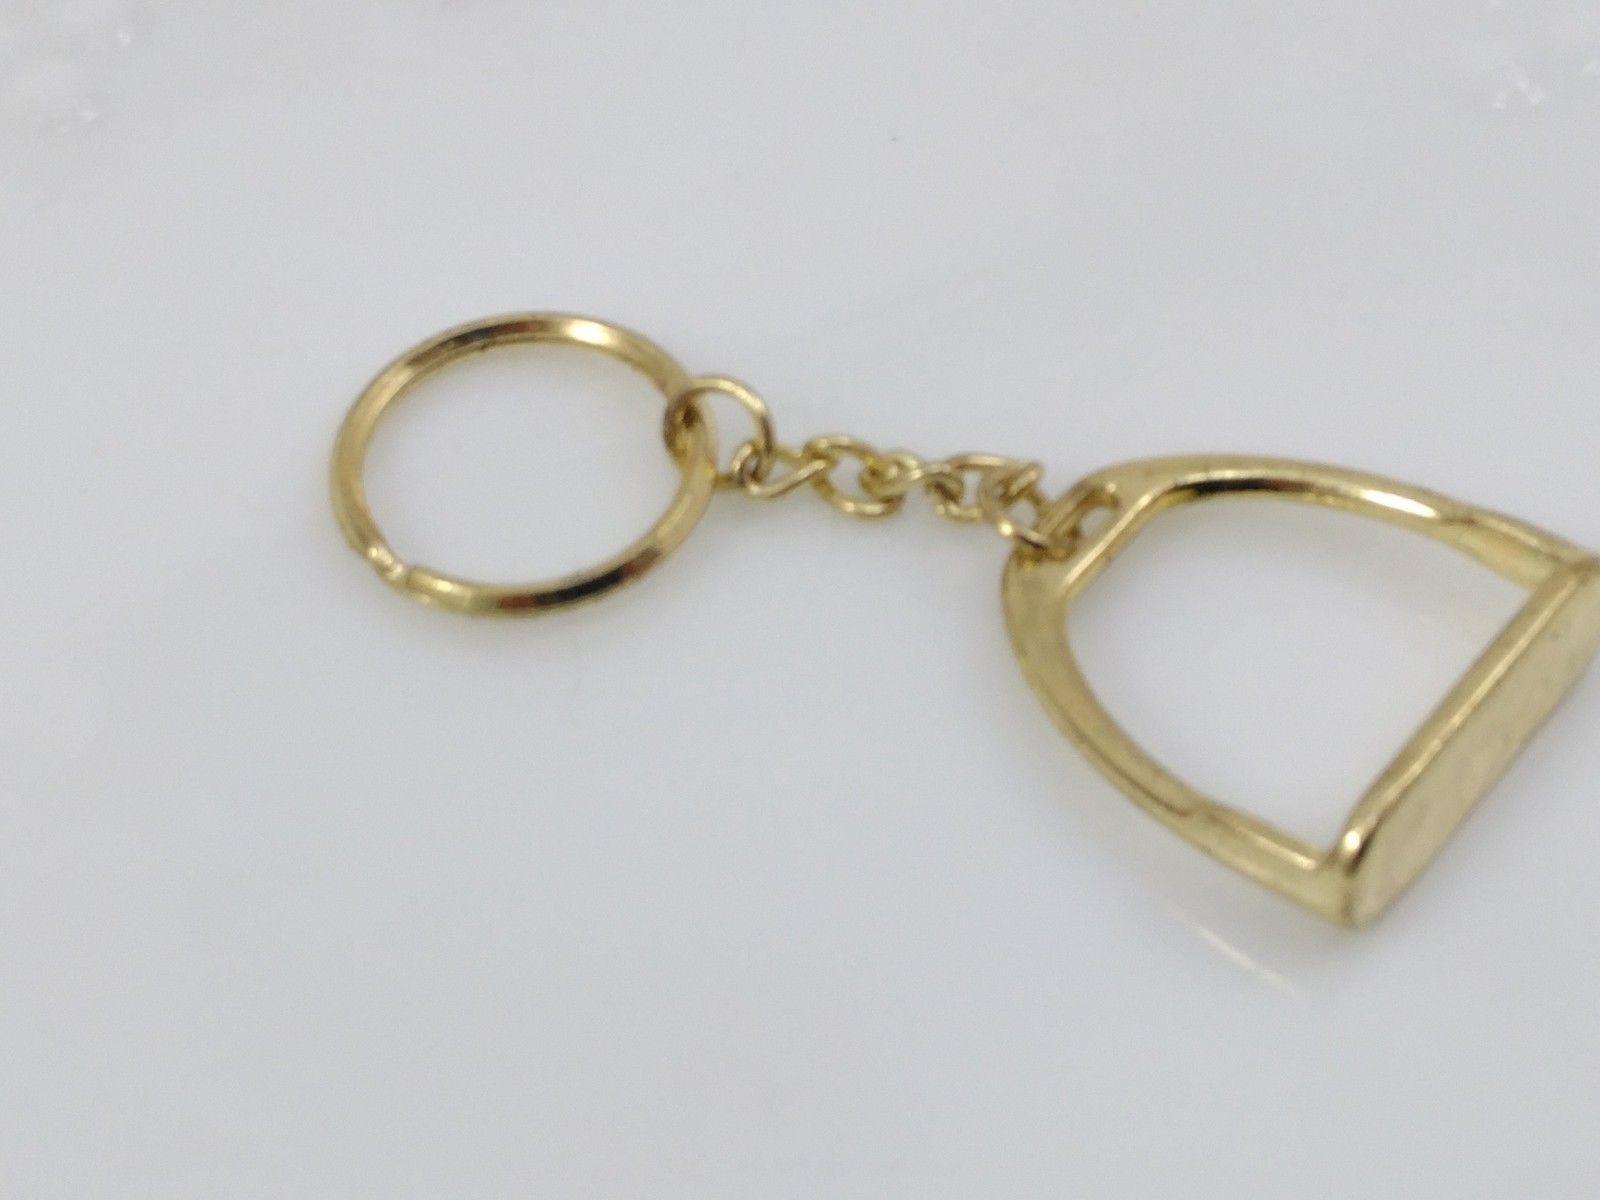 Zinc Alloy Stirrup Gold Tone Key Ring Horse Riding Equestrian Equipment